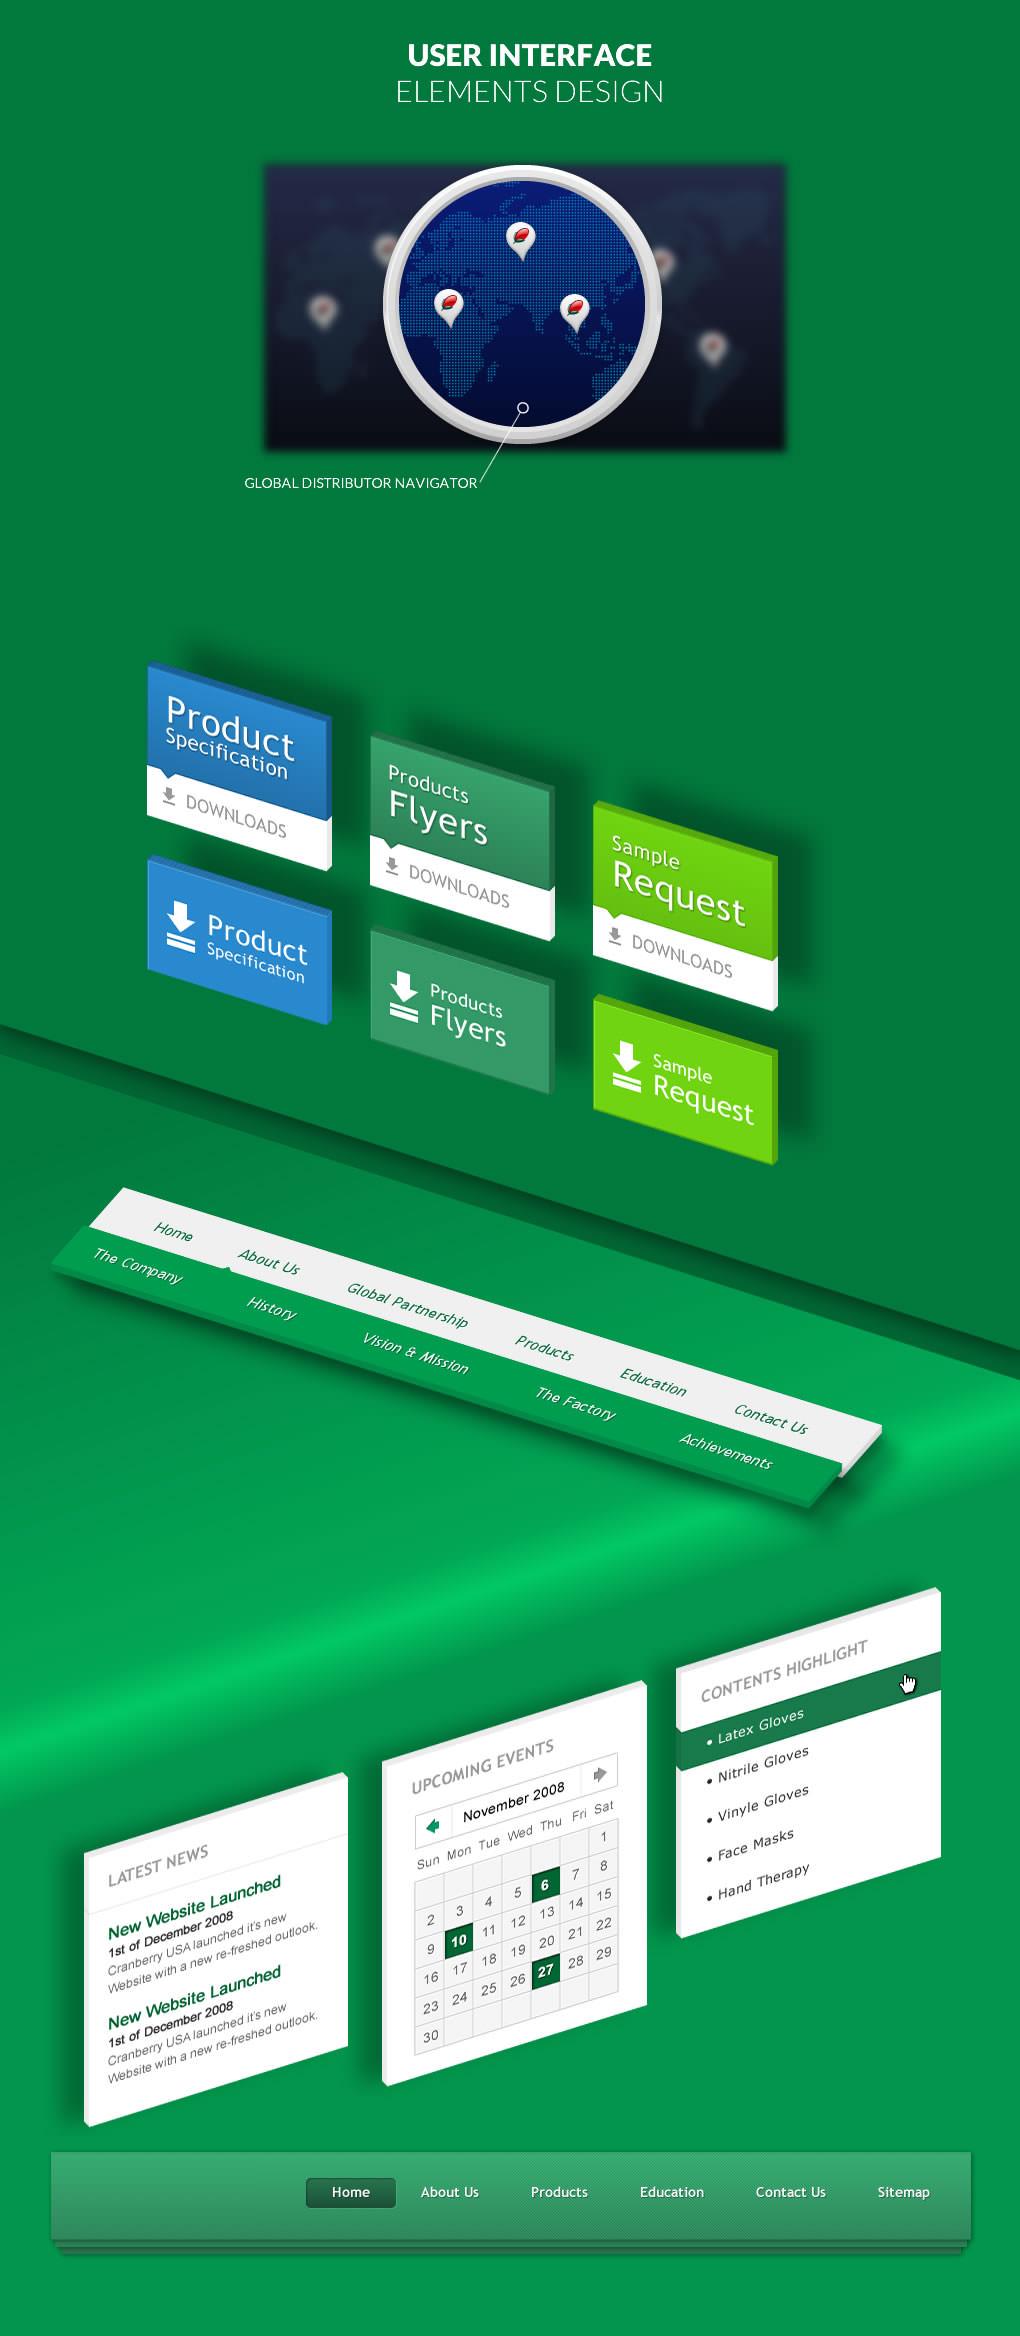 user interface elements such as buttons cards widgets menubar